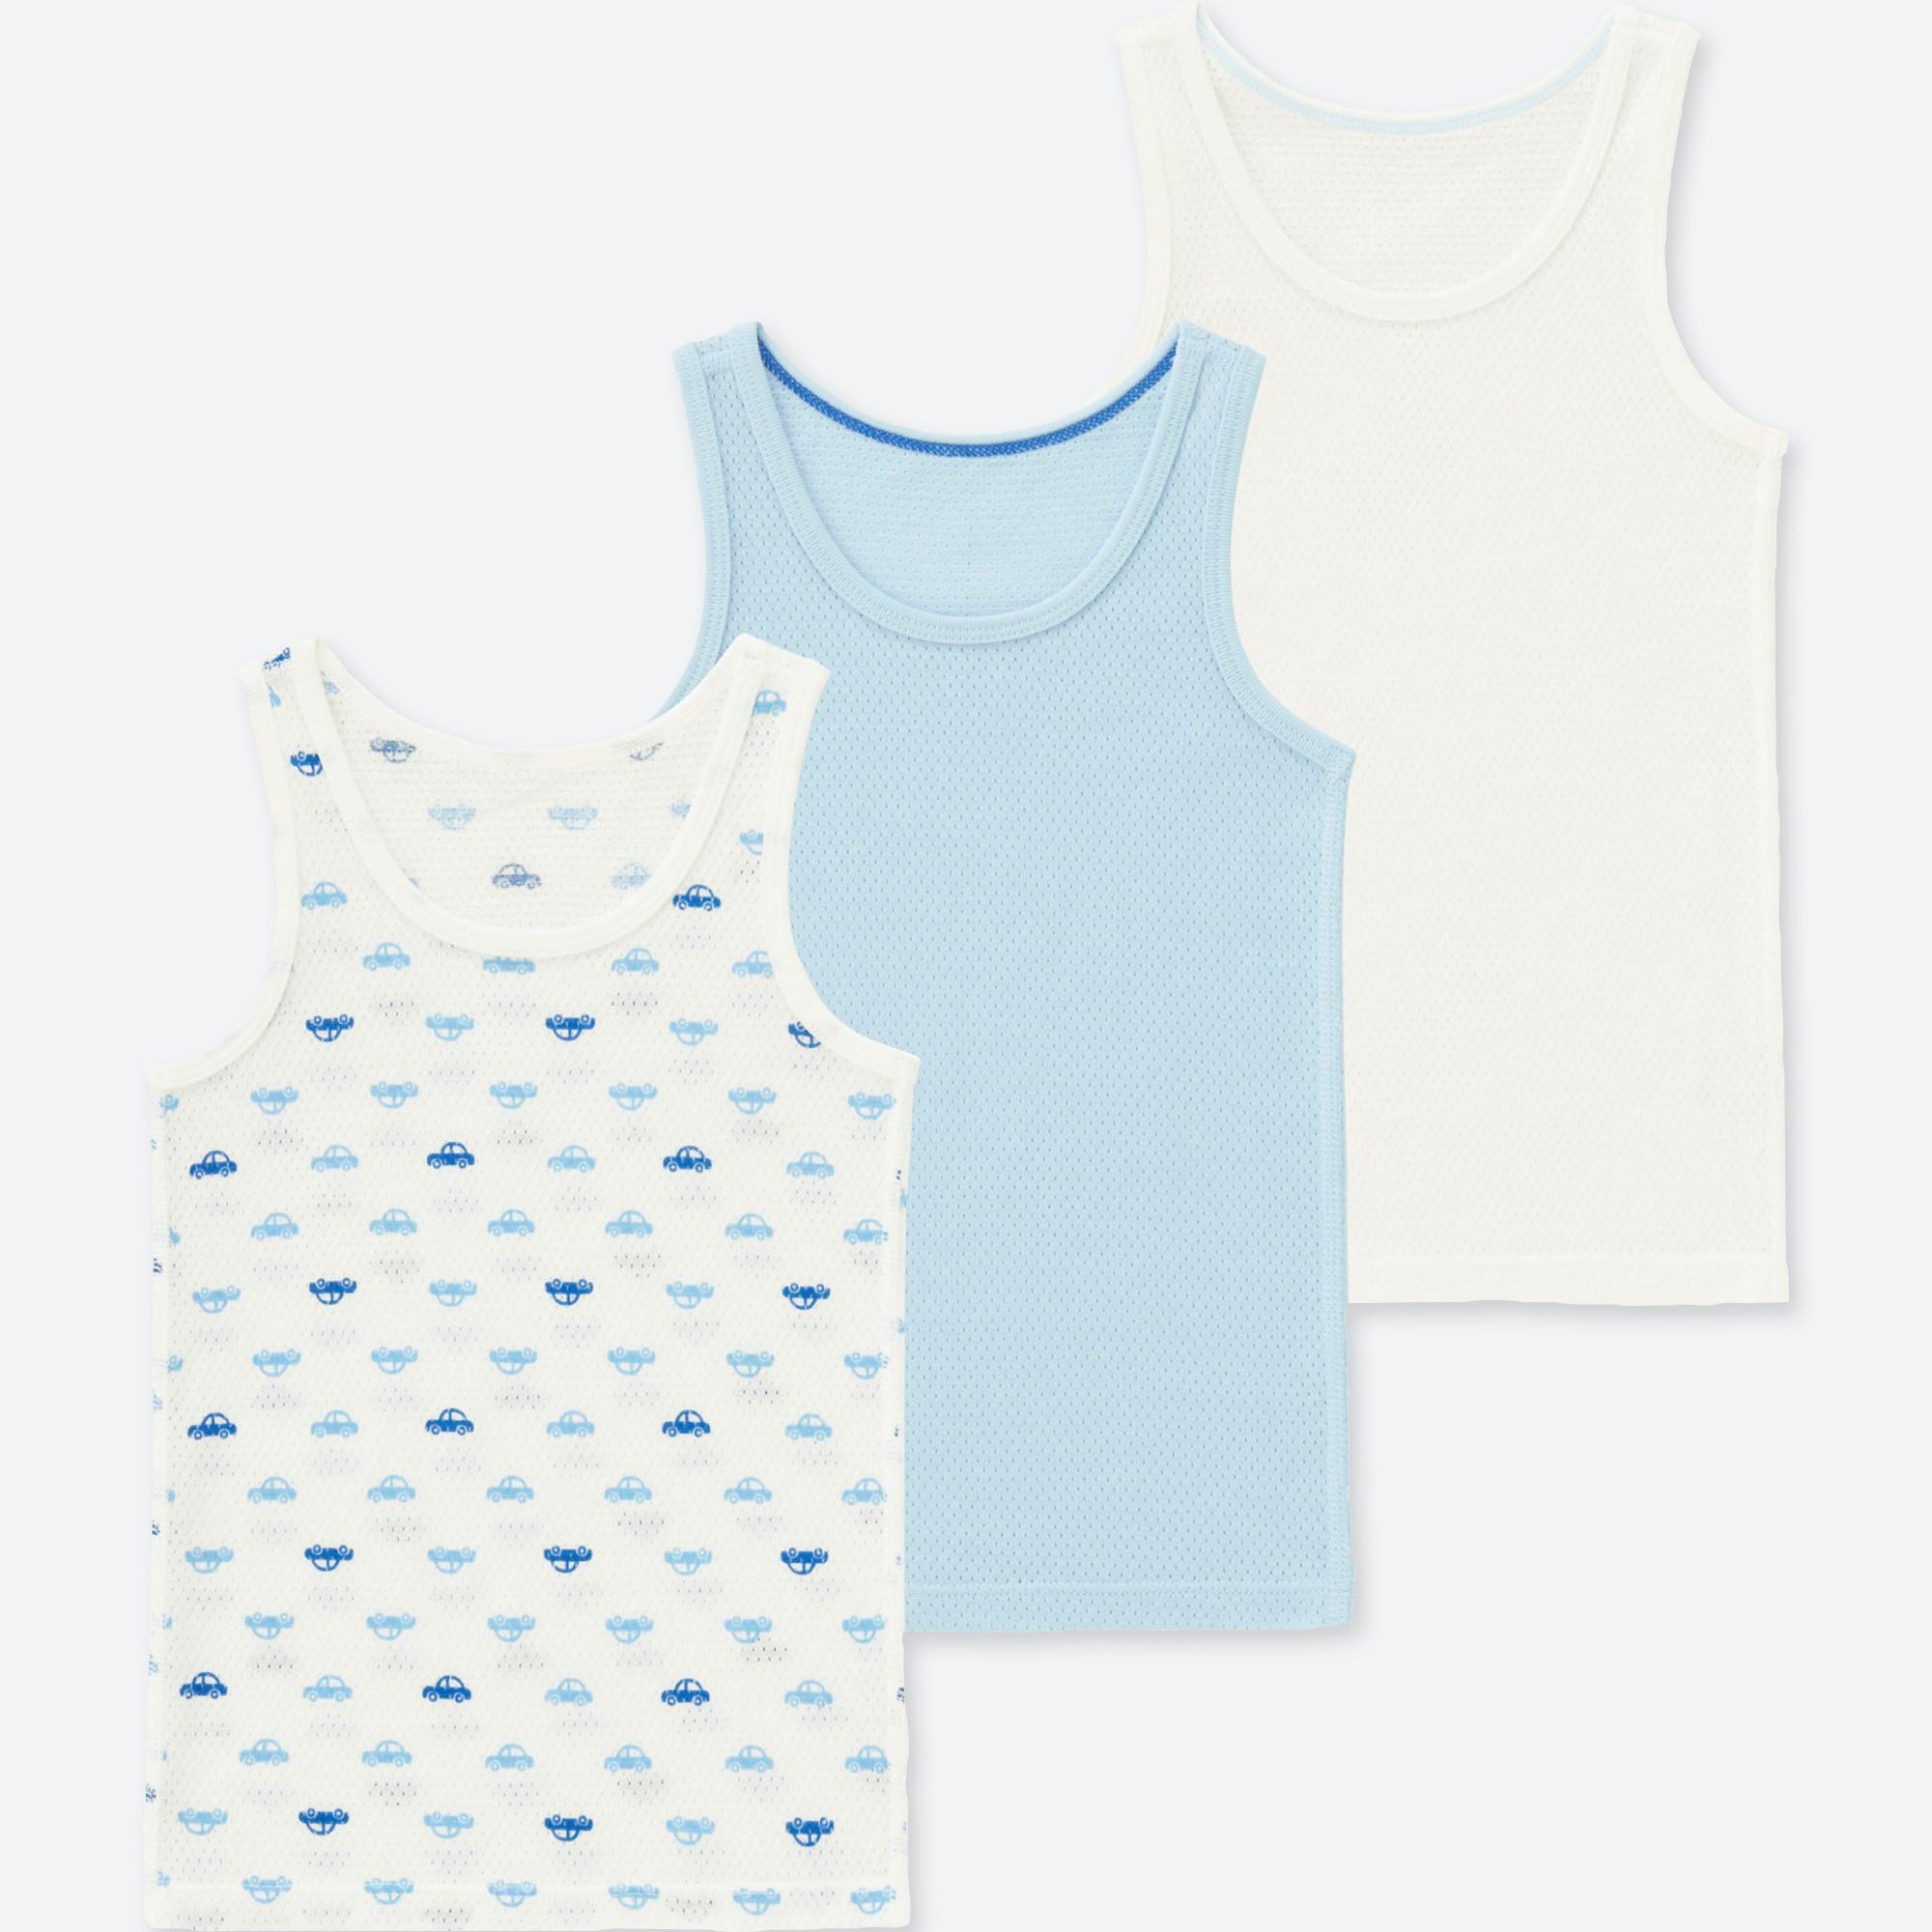 Toddler Little Boys Car Printed Sleeveless Vest Tank Top+Short Pants Clothing Set 18M-8T